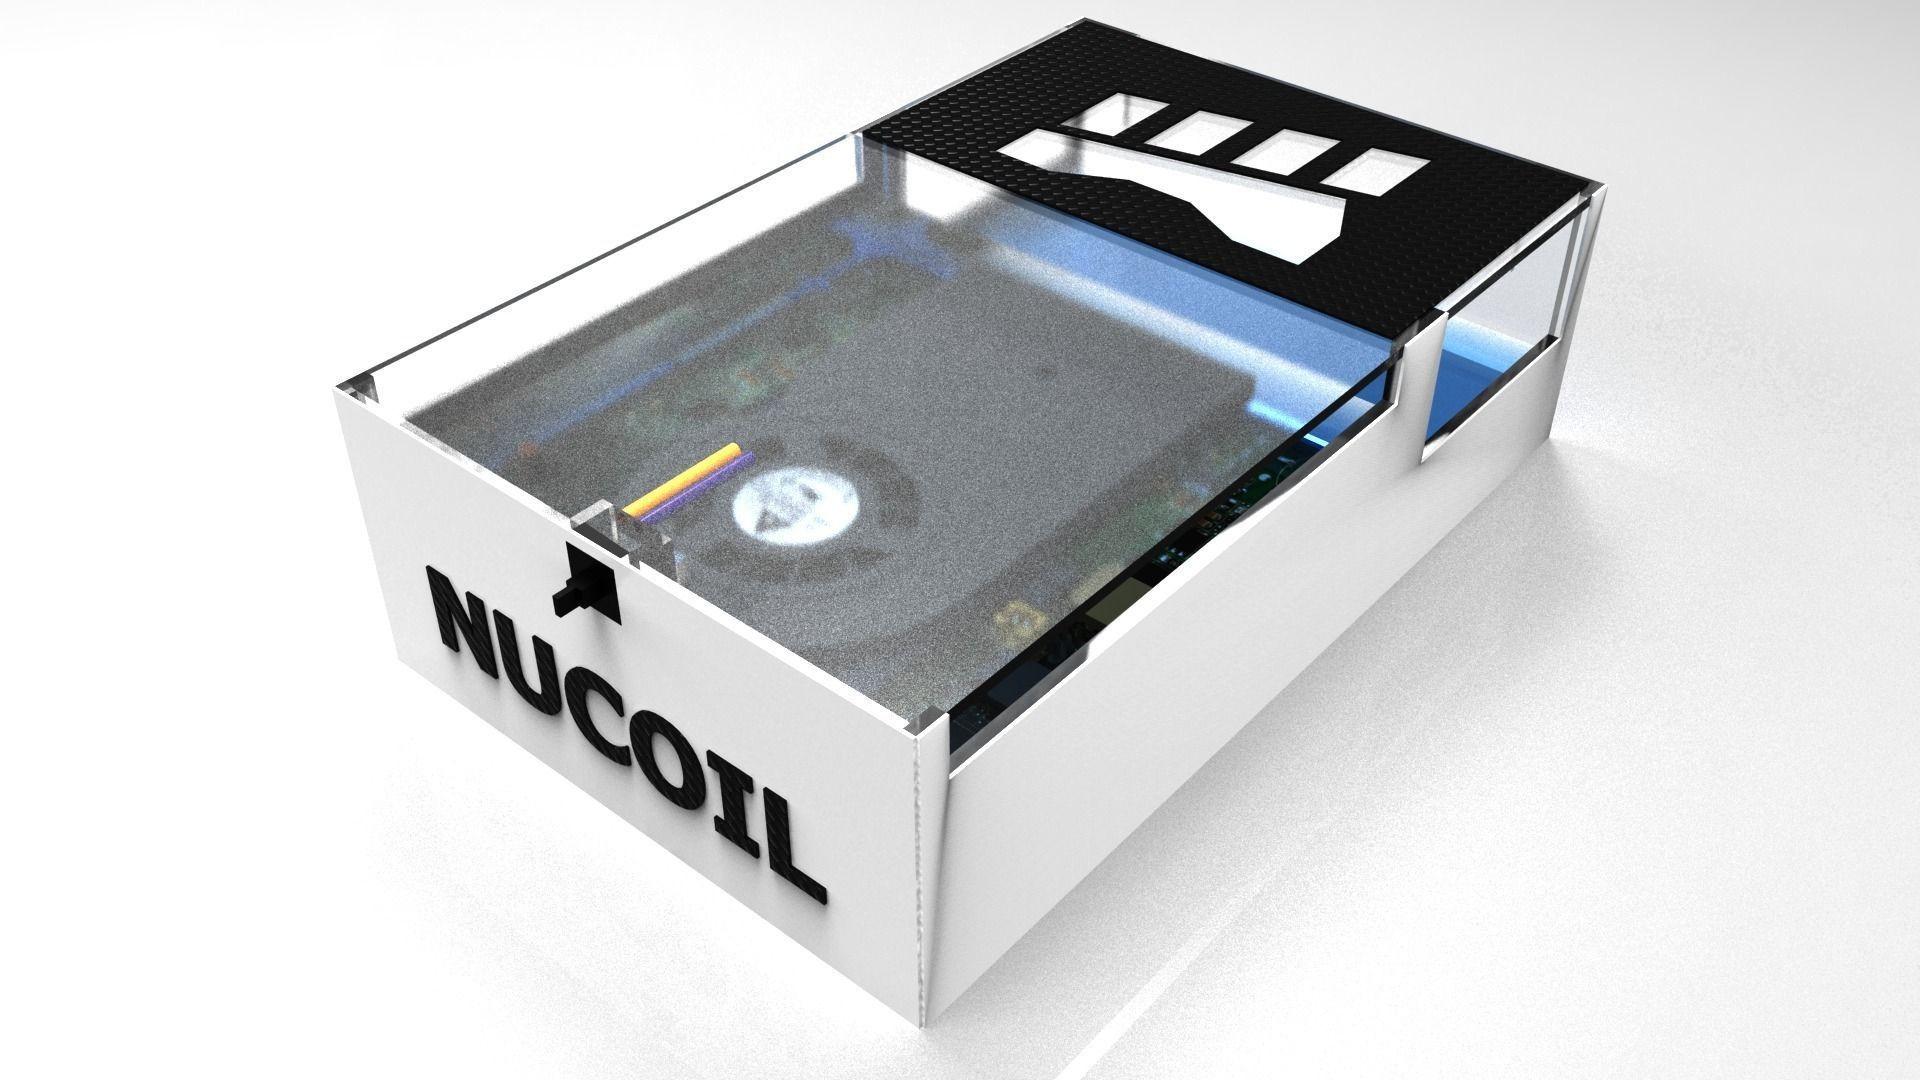 Streacom Shows Off Upcoming NUC Case | TechPowerUp Forums